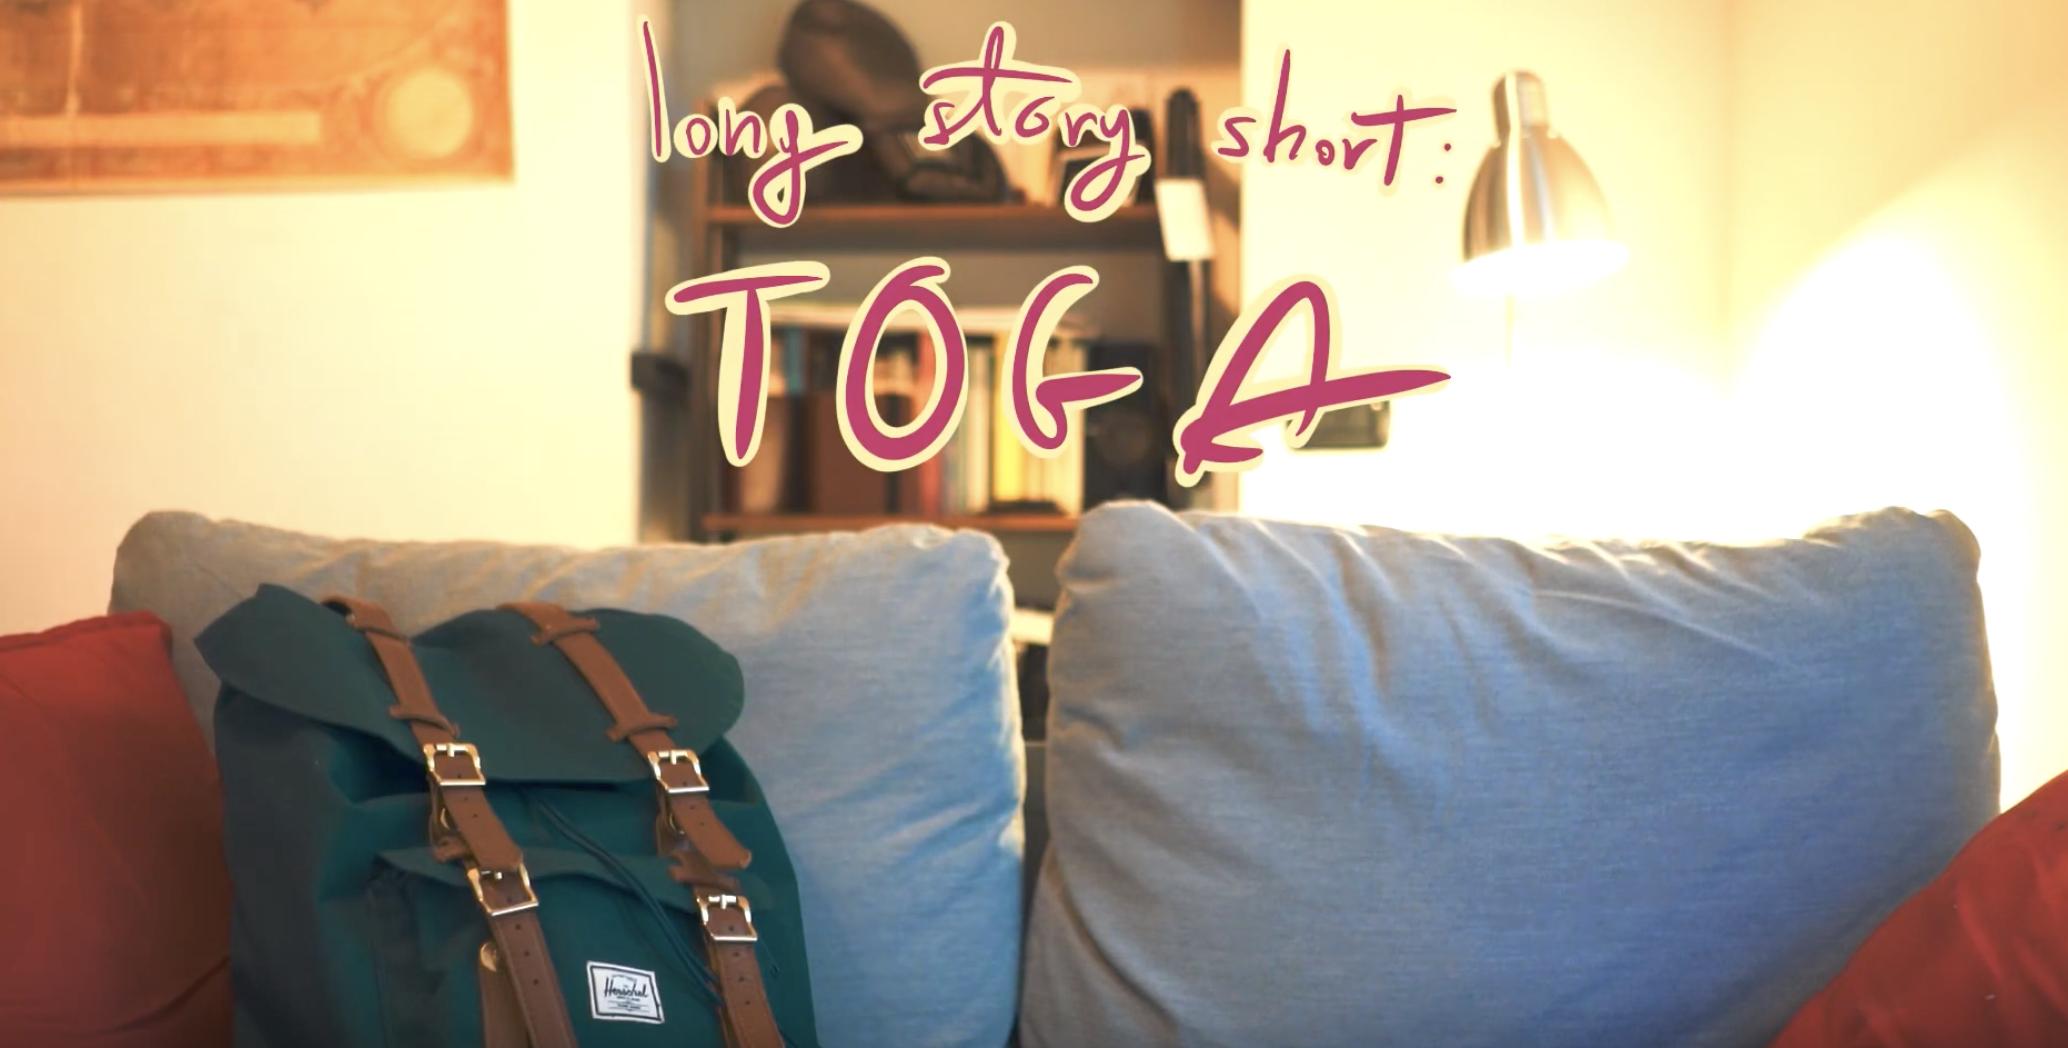 Long story short: Toga